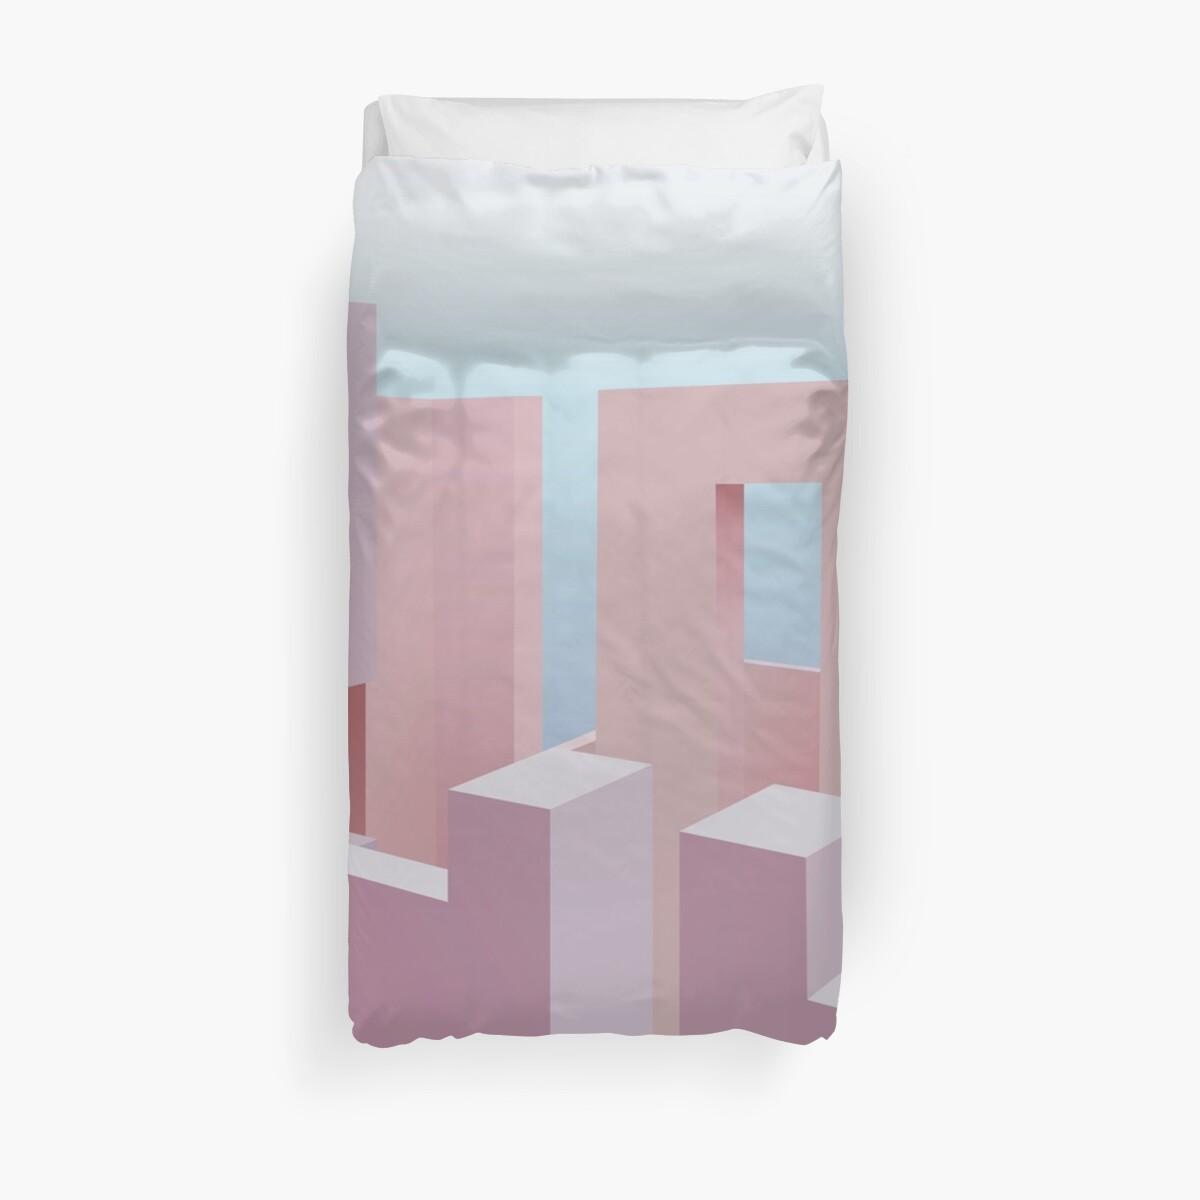 «Edificios rosados» de noctnlcreatures